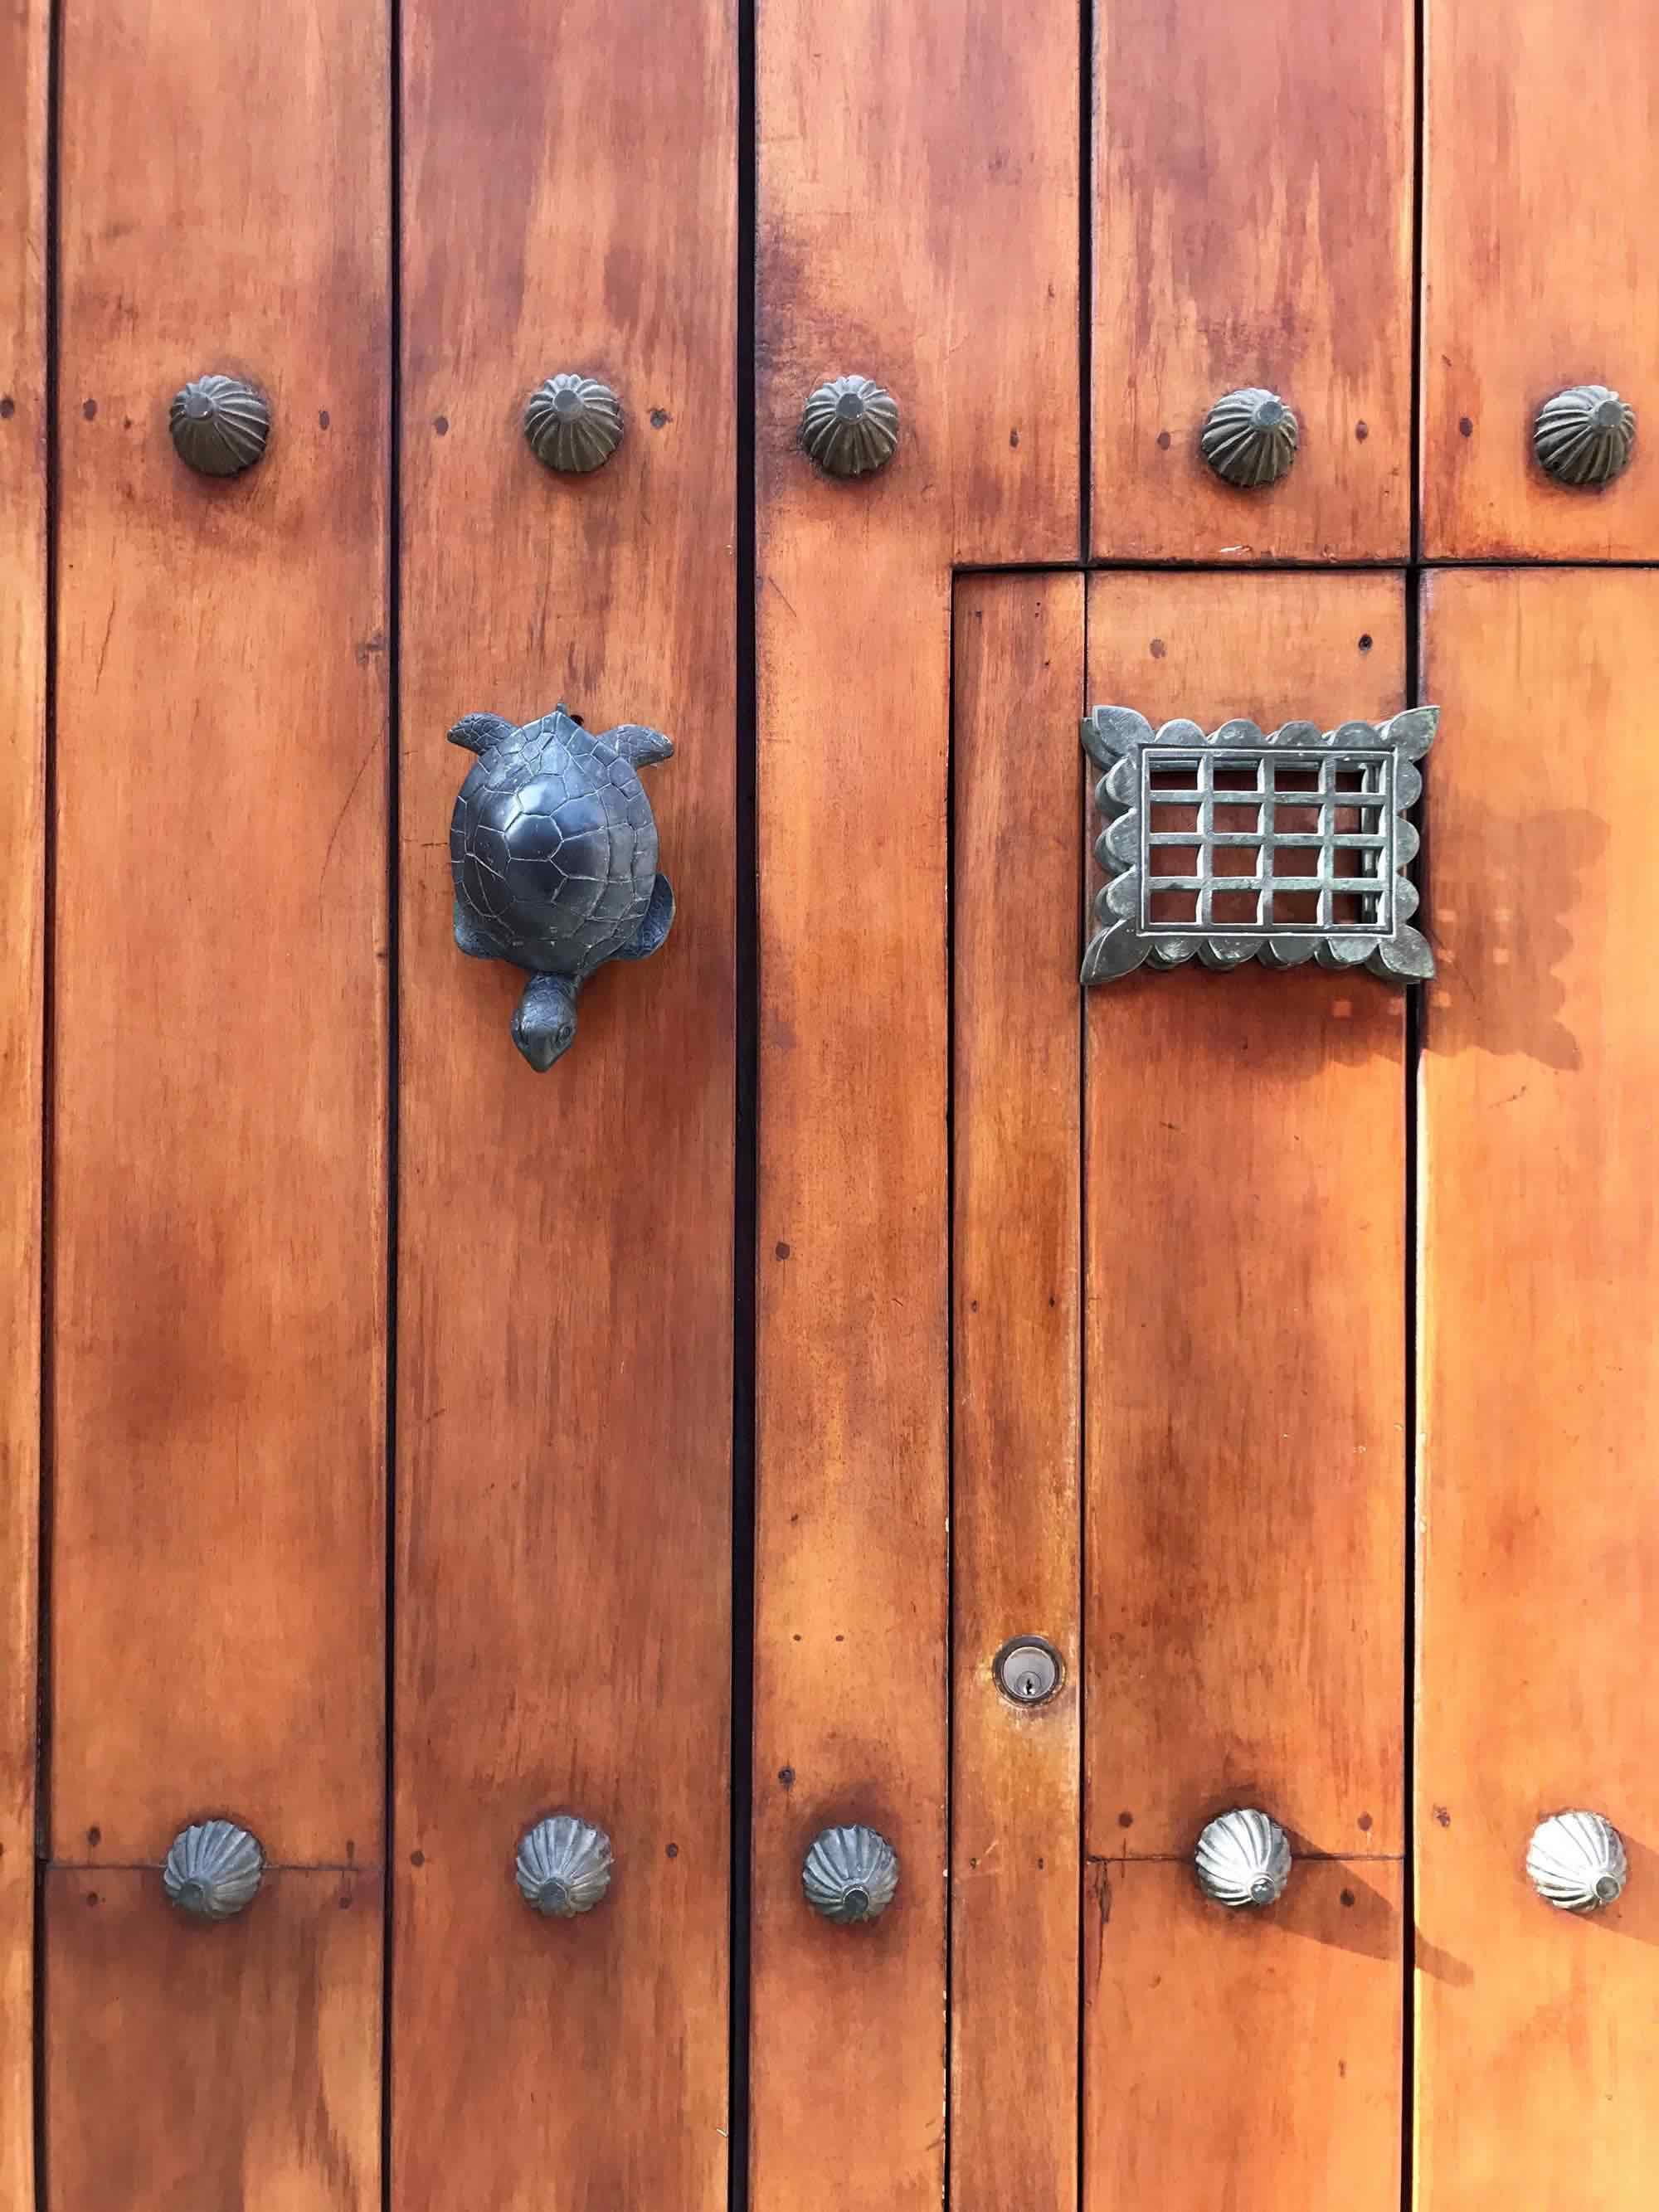 turtle door knocker in Cartagena, Colombia | pictures of Cartagena, Colombia